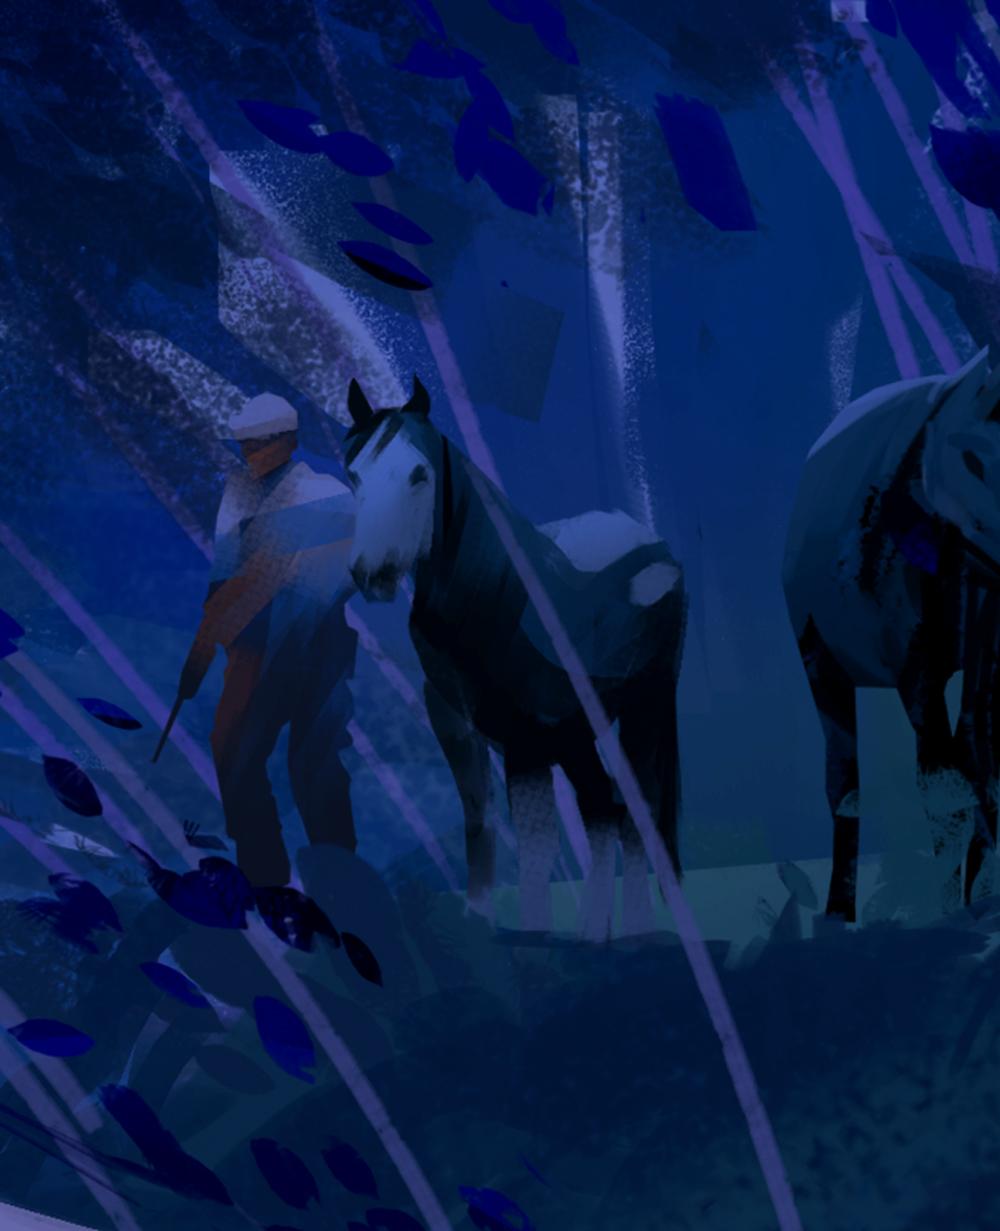 Illustration de Sandrine Pilloud | Campfire | Livre Kanako Sawada écrit par Lionel Tardy